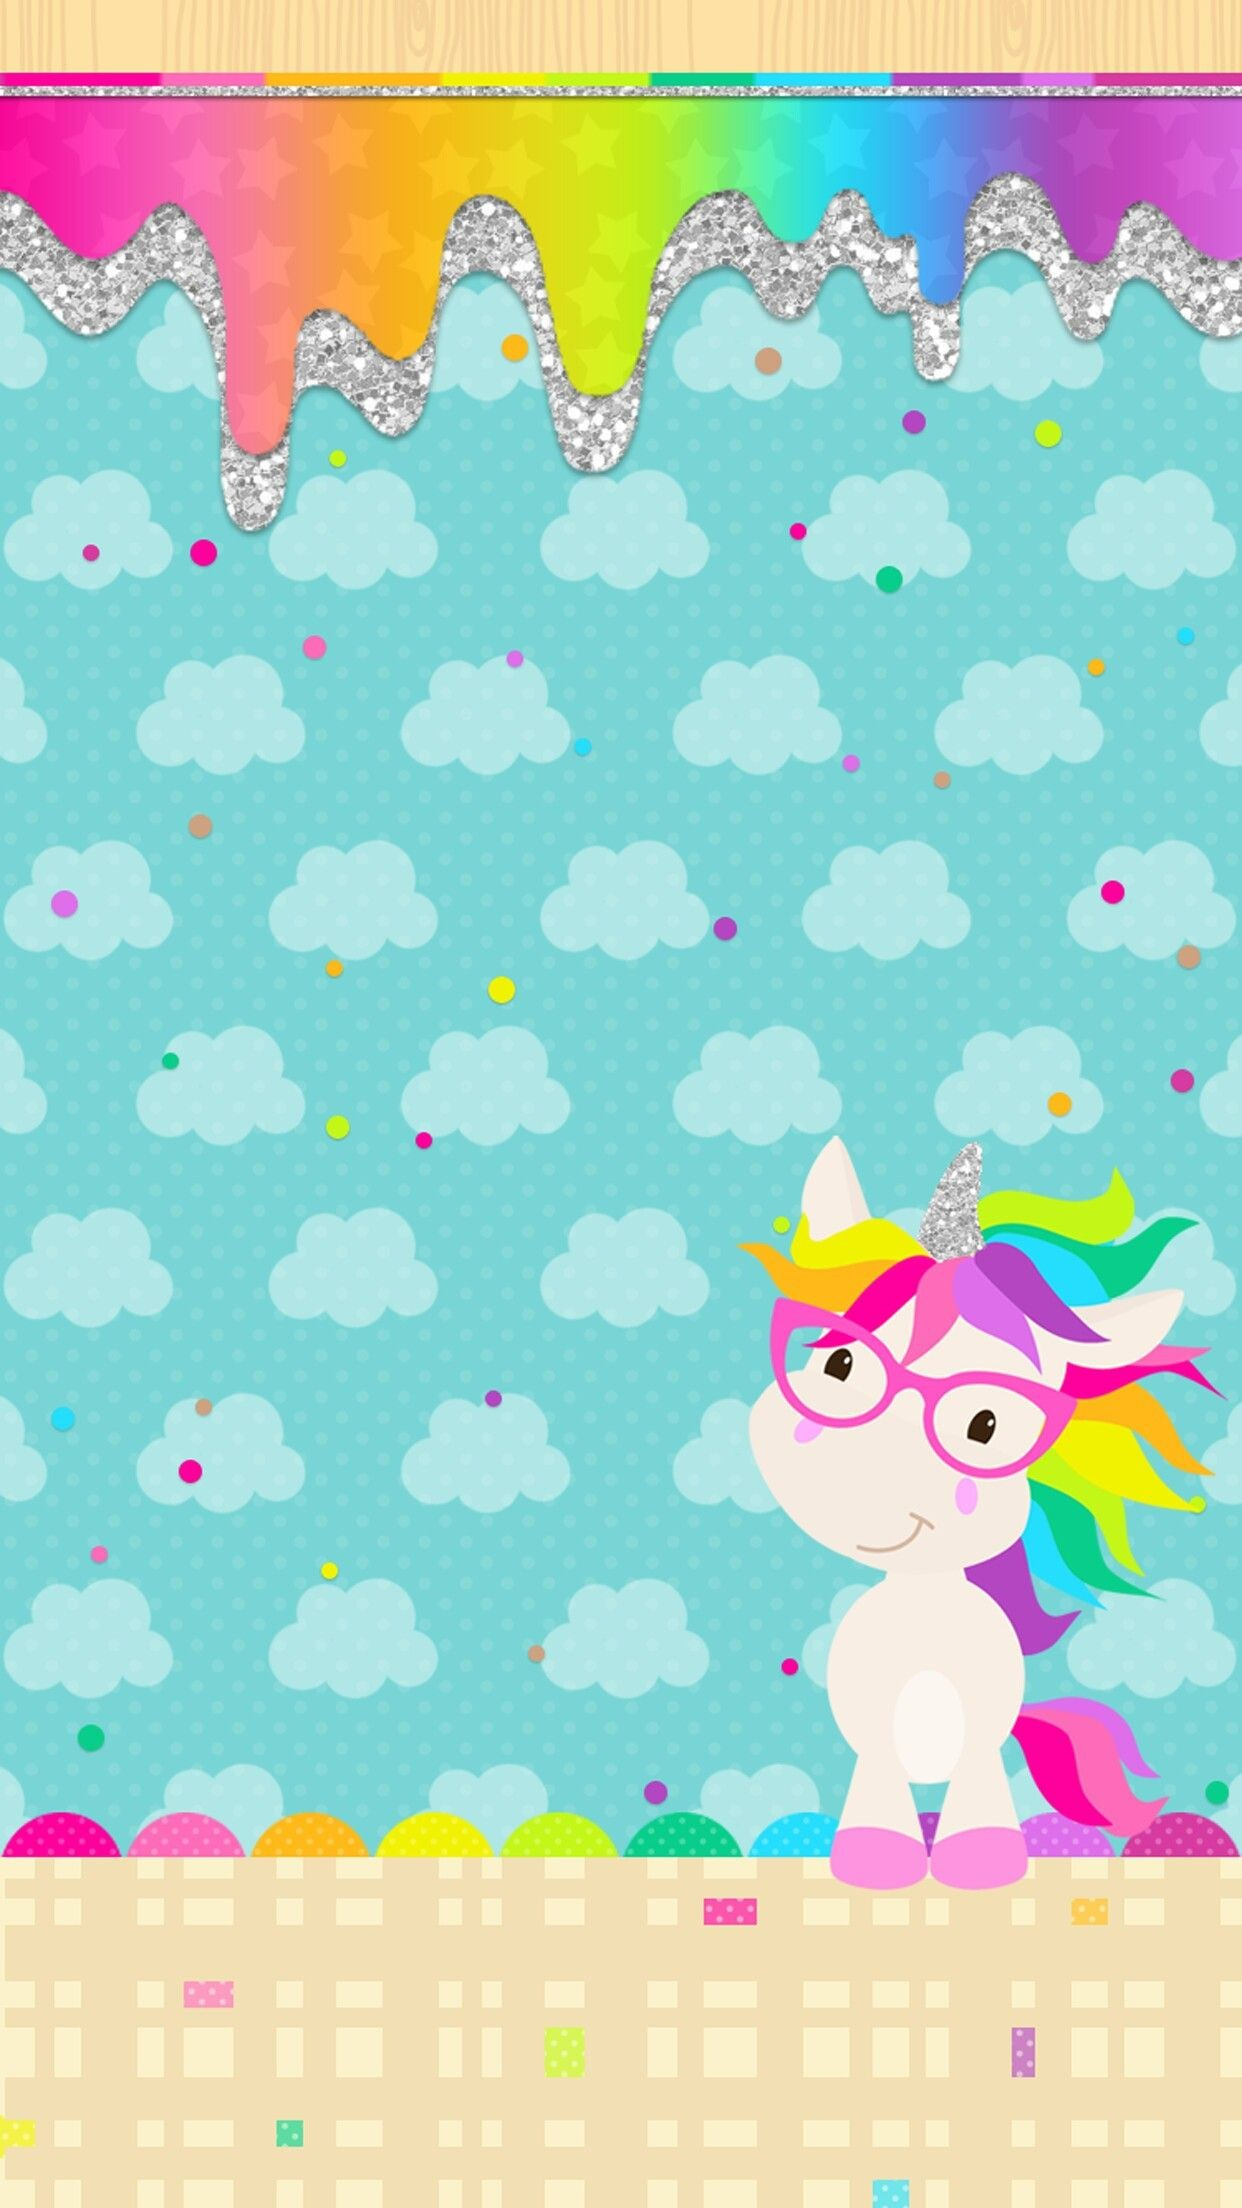 Res: 1242x2208, Cute Unicorn, Unicorn Party, Unicorn Birthday, Cute Wallpapers, Iphone  Wallpapers, Rainbow Wallpaper, Unicorn Wallpaper Cute, Colorful Wallpaper,  ...